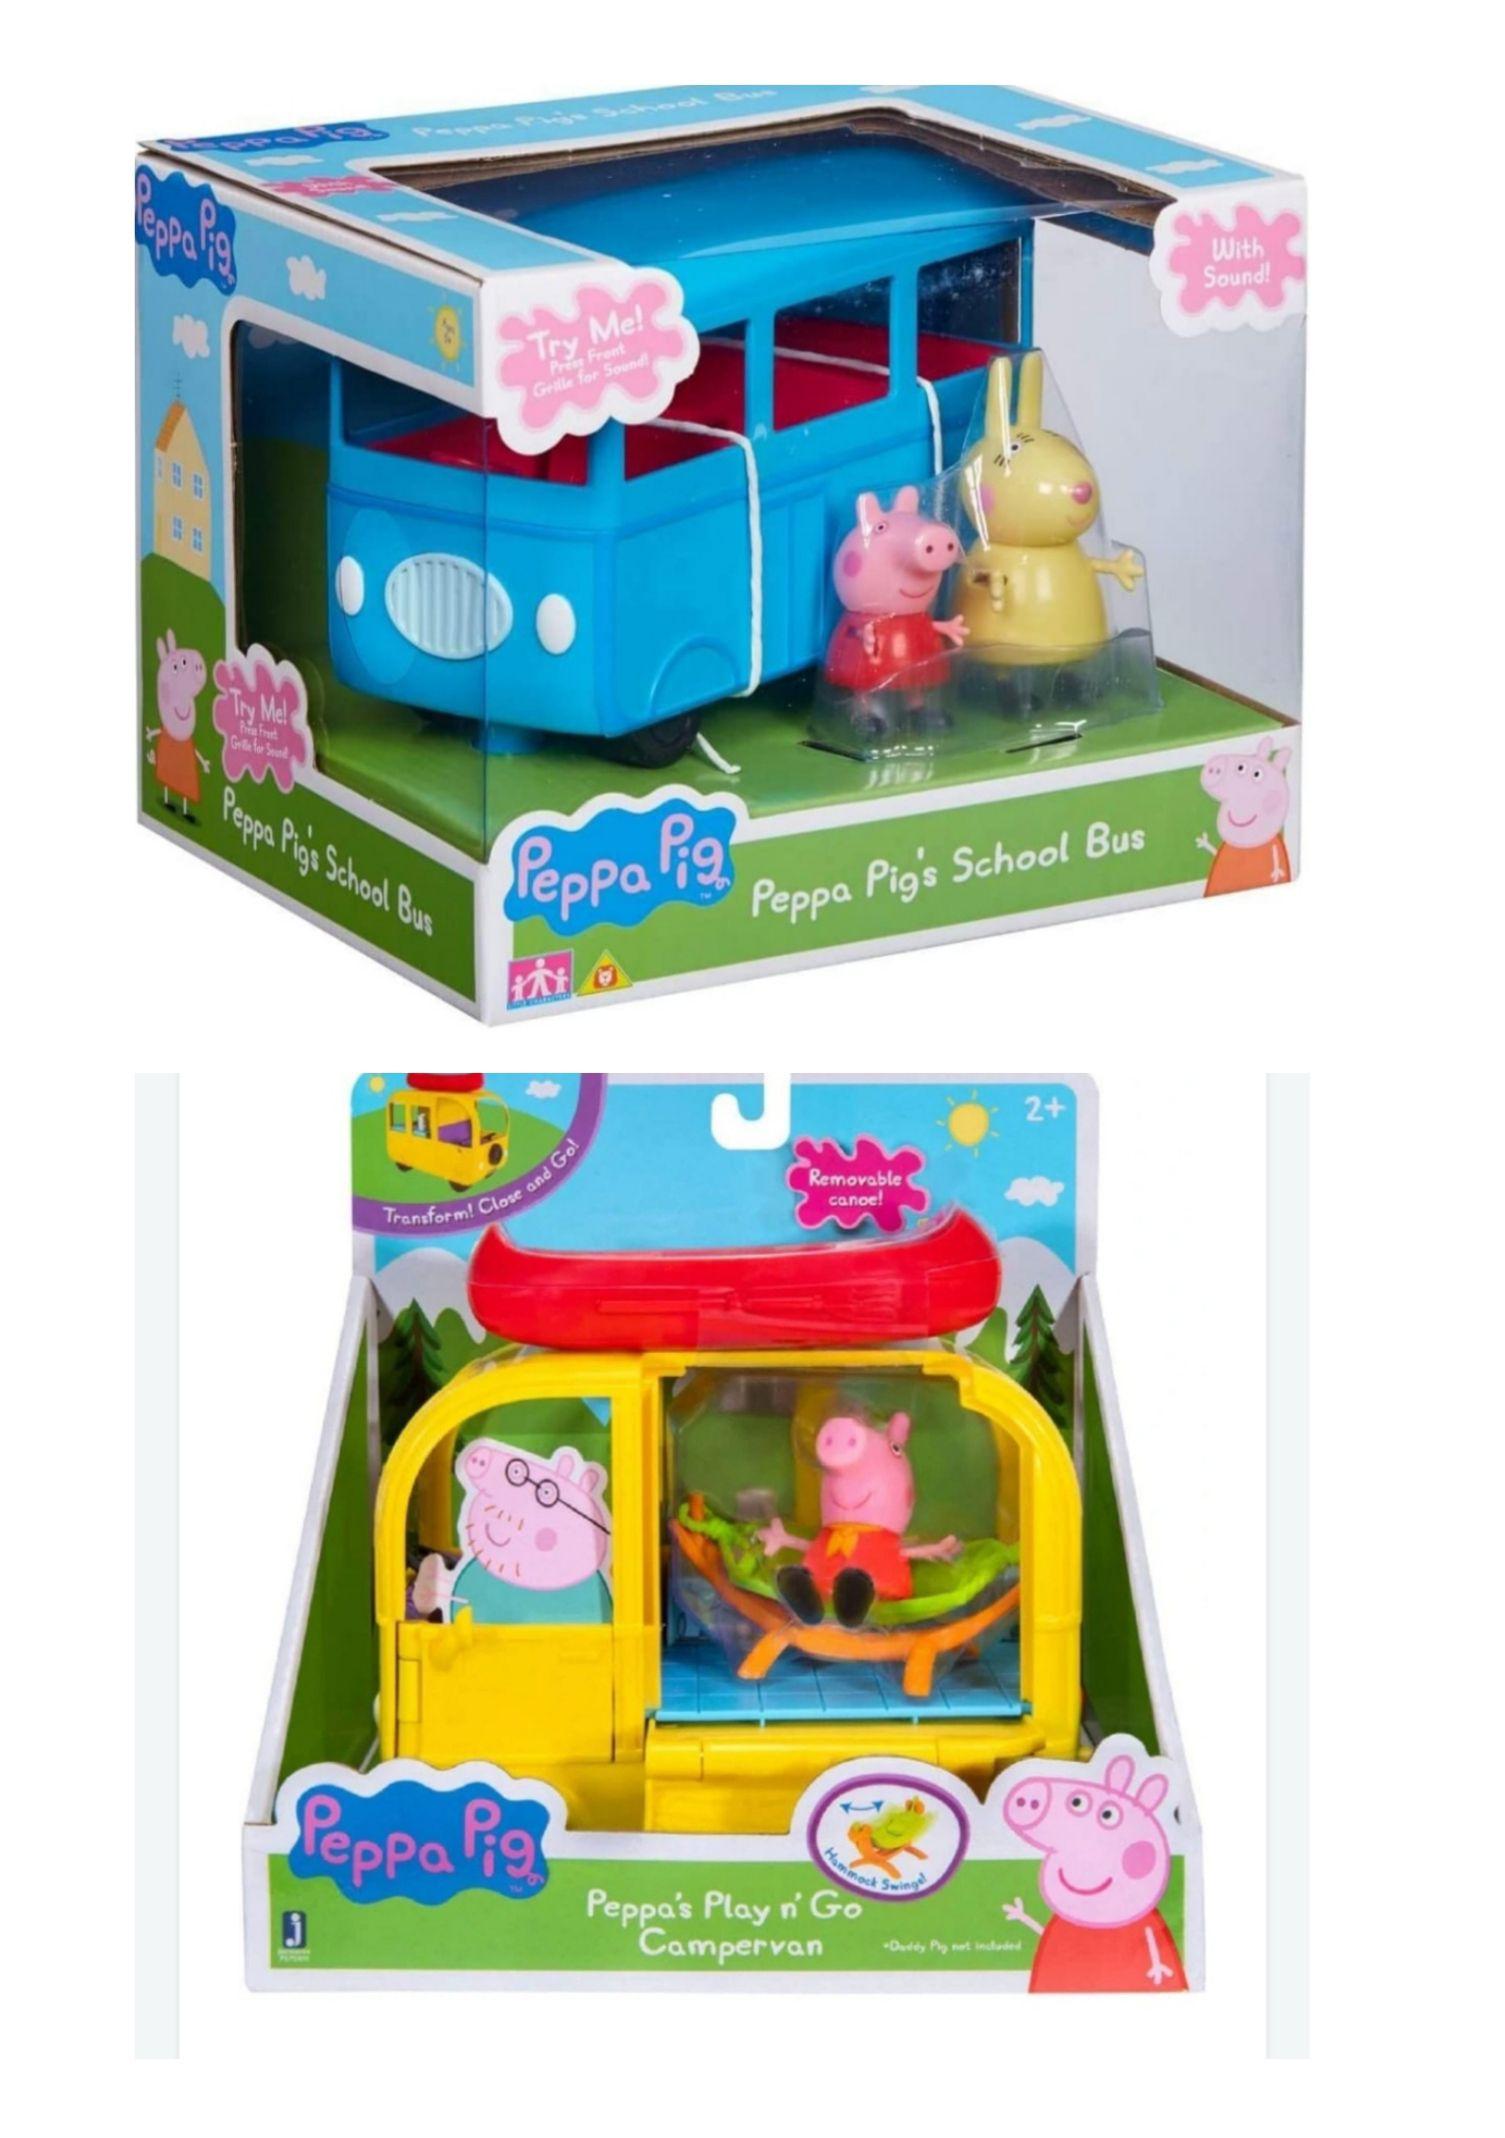 Peppa pig toys £5 each found instore b&m Sunderland